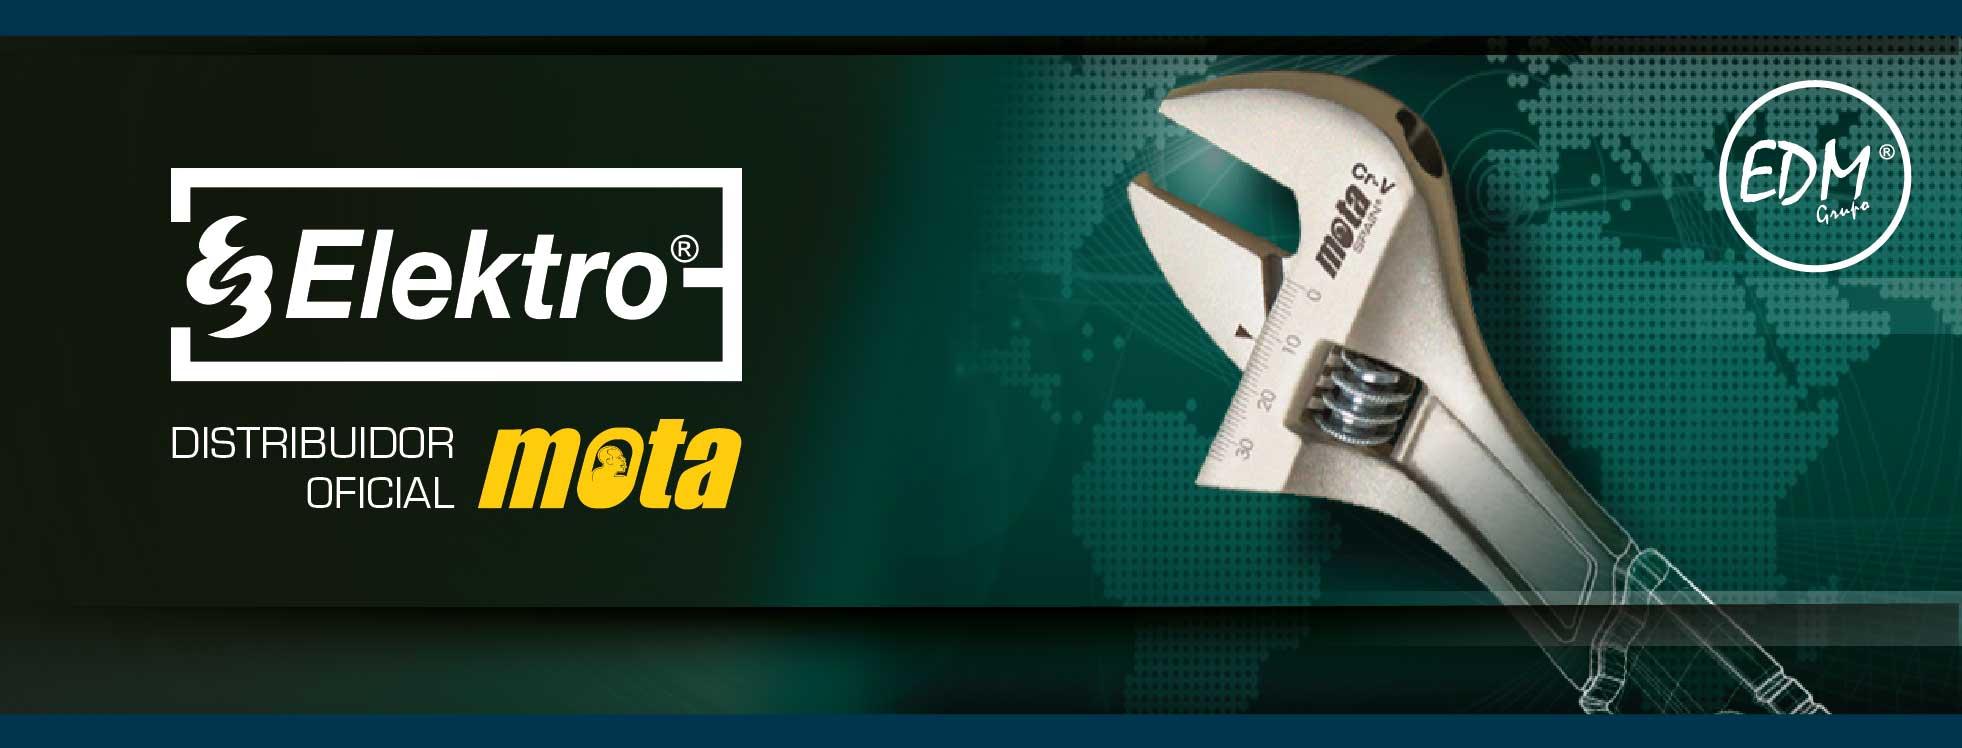 Gupo EDM - Distribuidor Oficial de Mota Herramientas